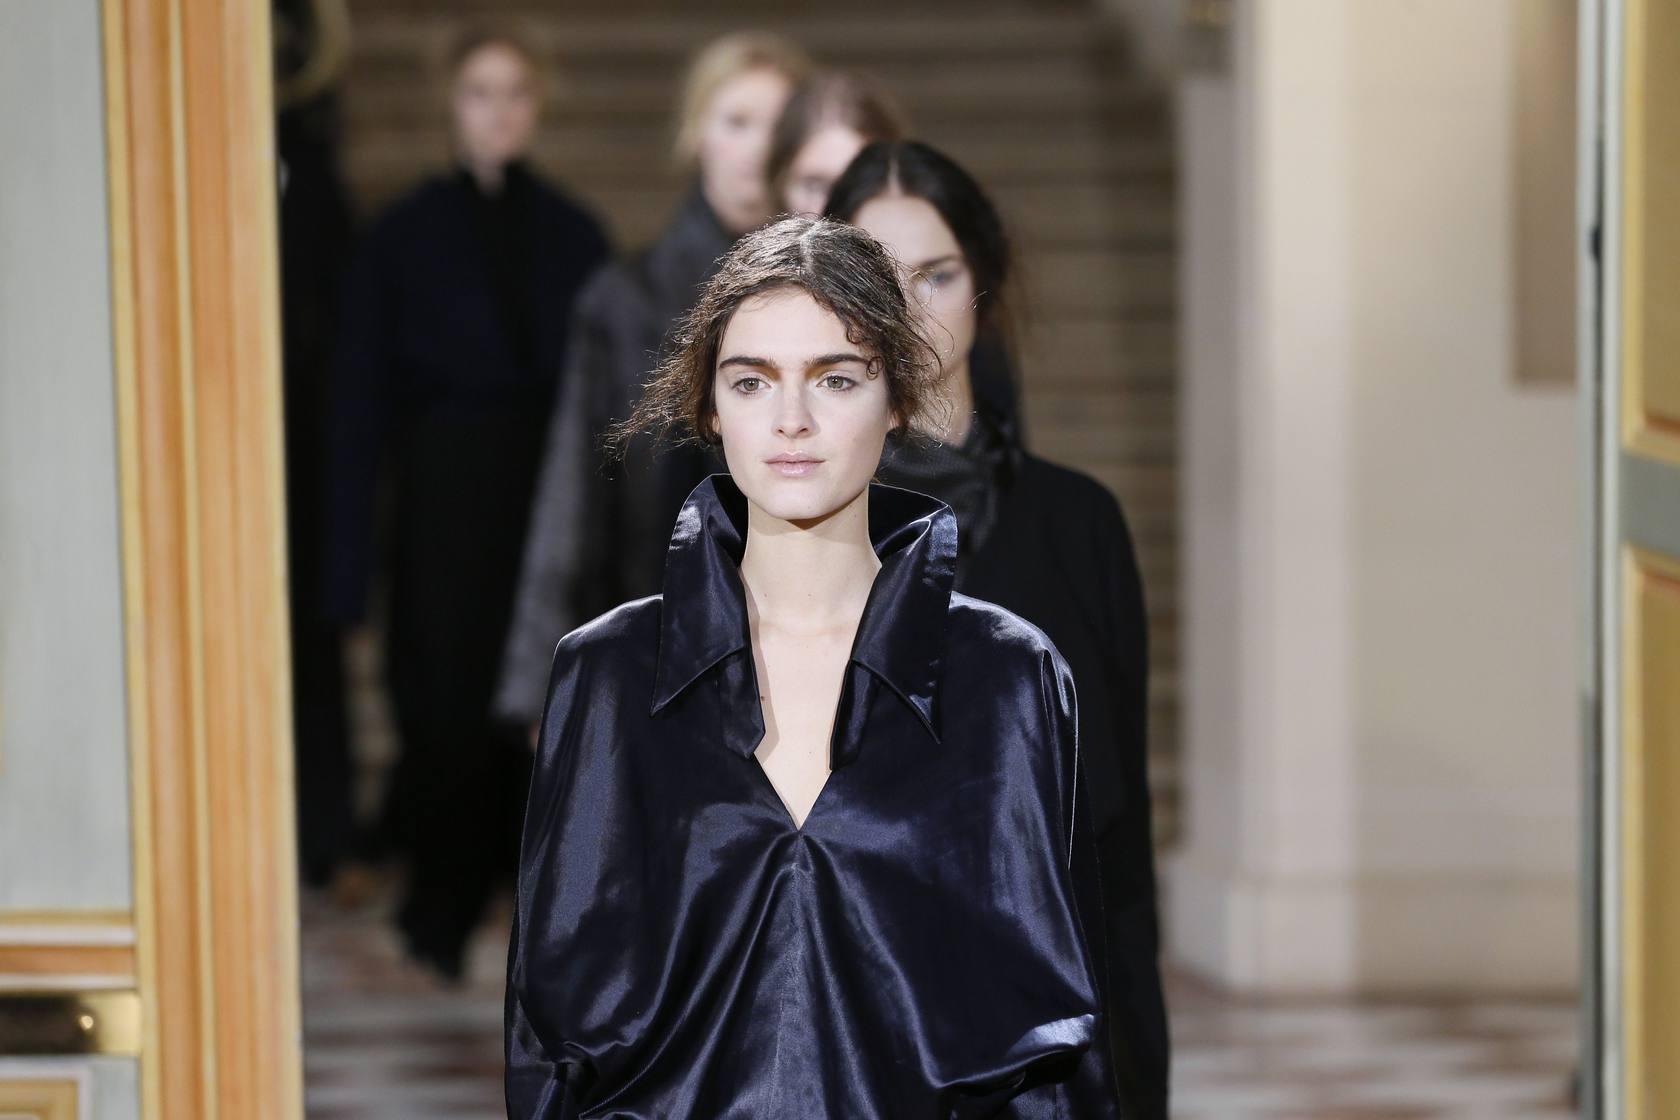 Primera jornada de la Semana de la Moda de París